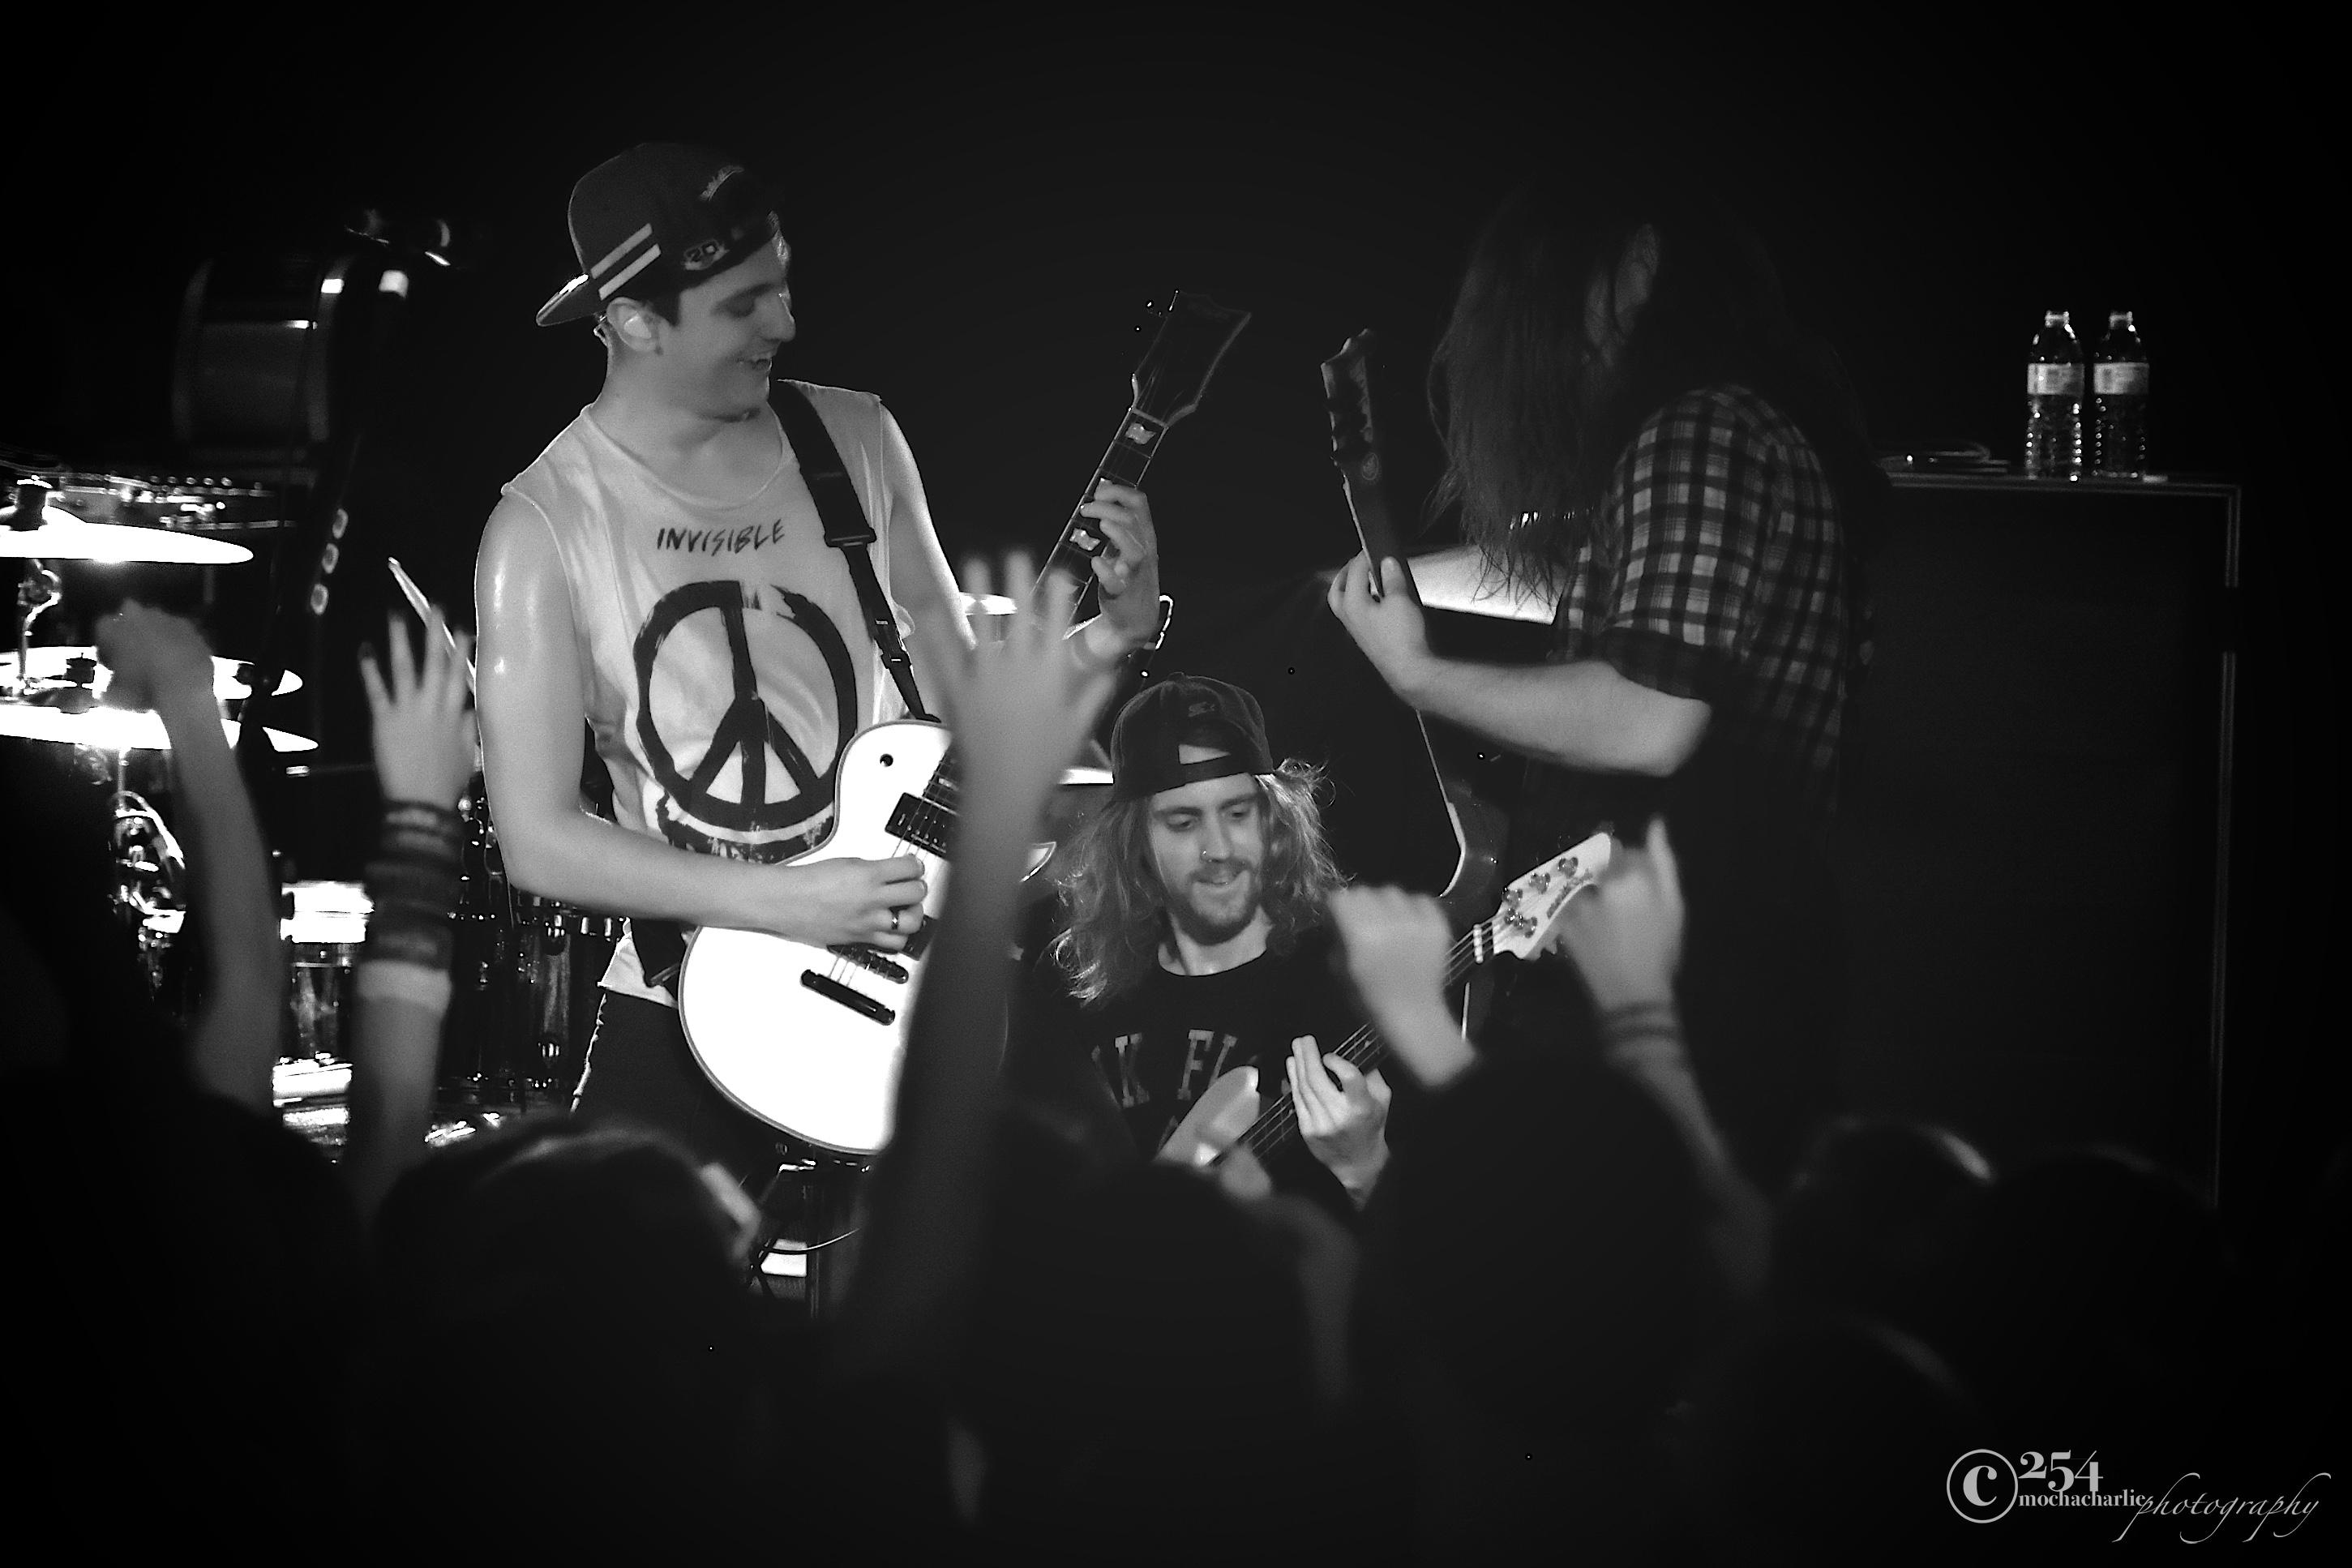 Tonight Alive! at El Corazon (Photo by Mocha Charlie)